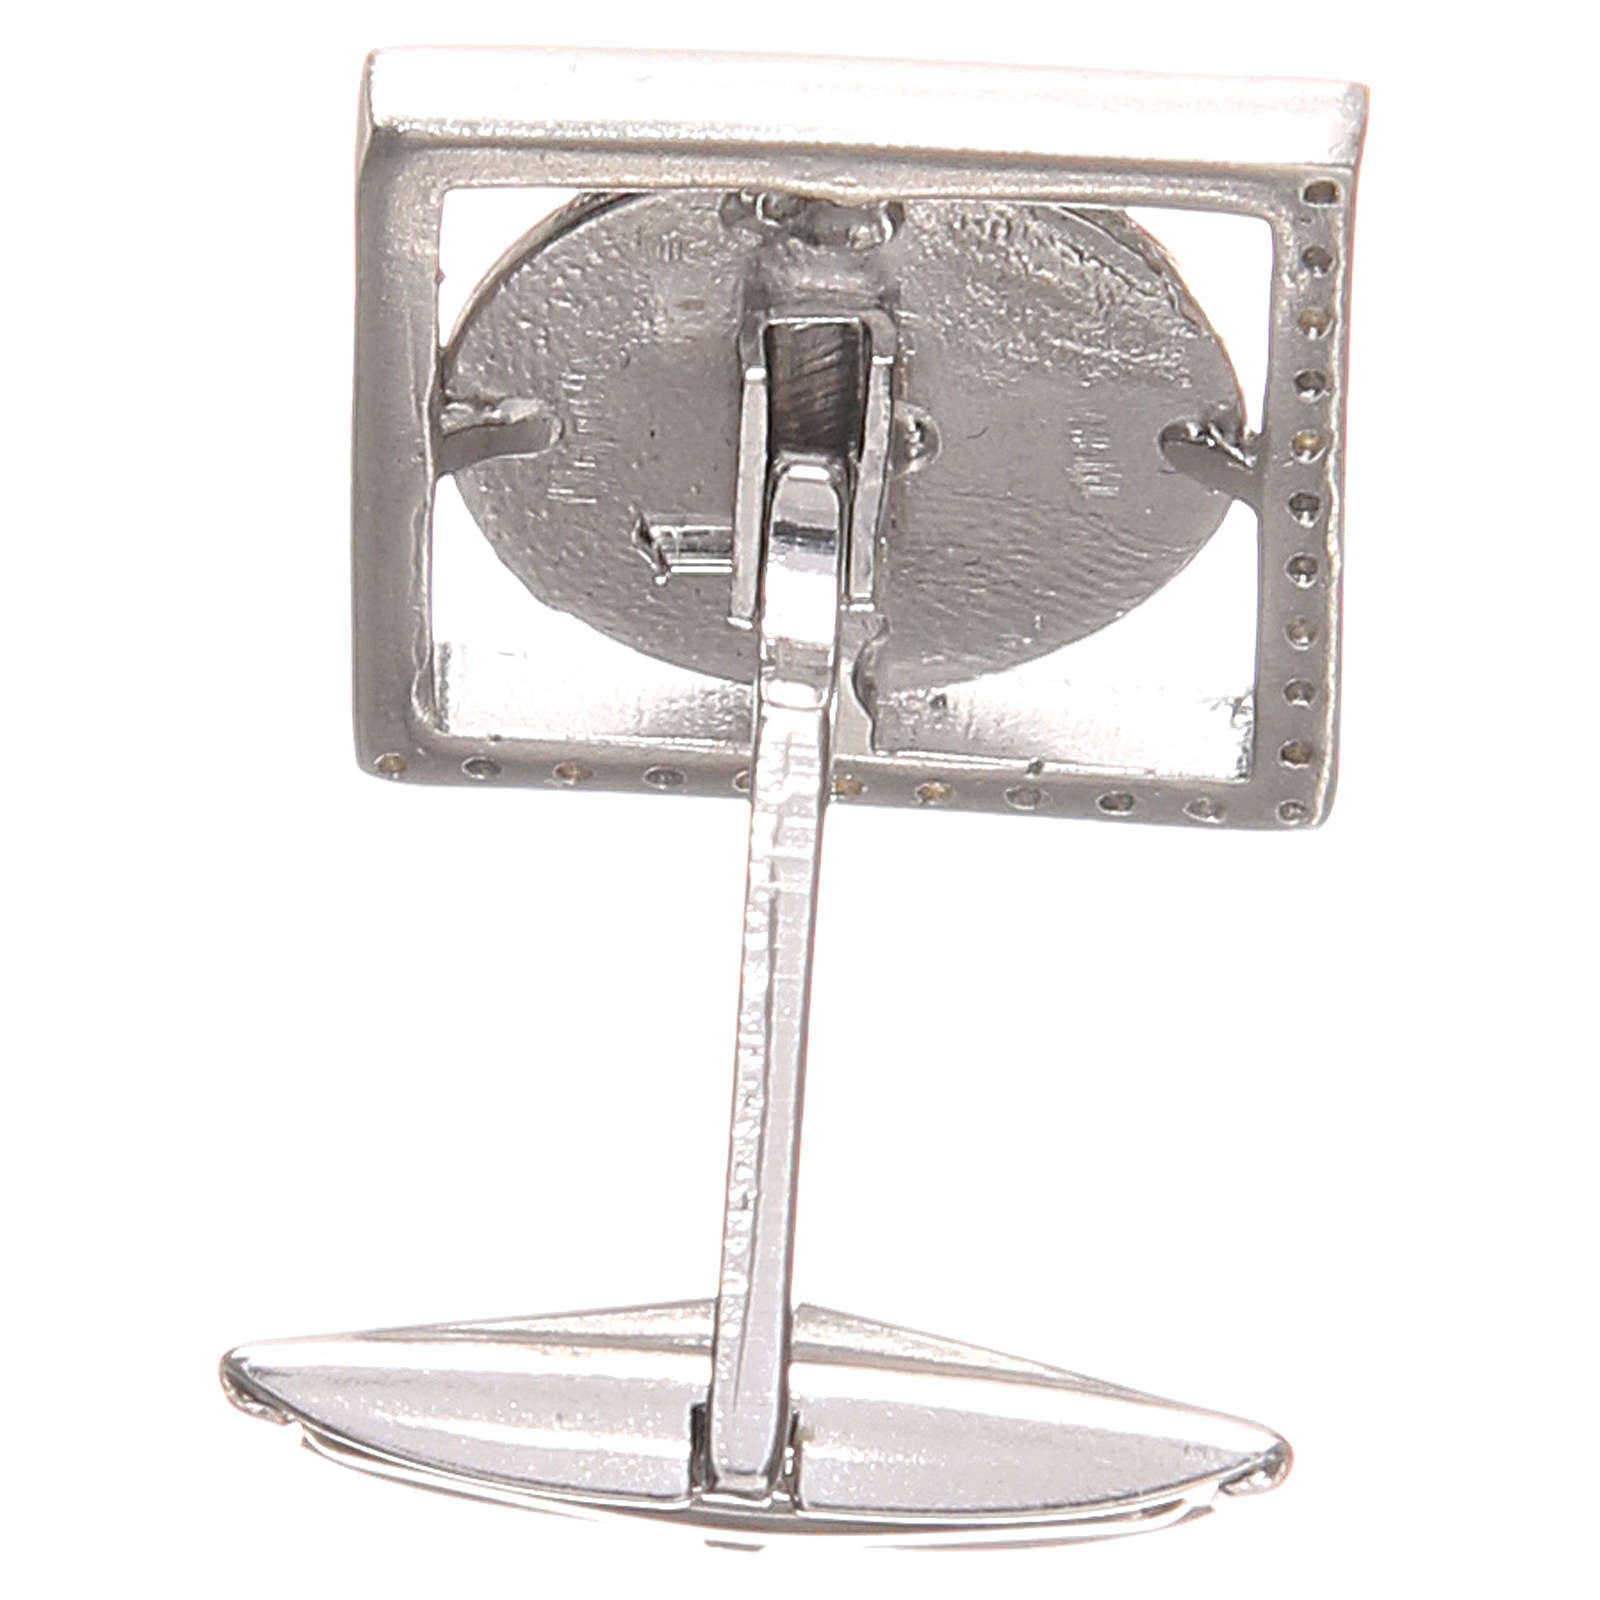 Gemelli camicia argento 925 Madonna Miracolosa 1,7x1,7 cm 4